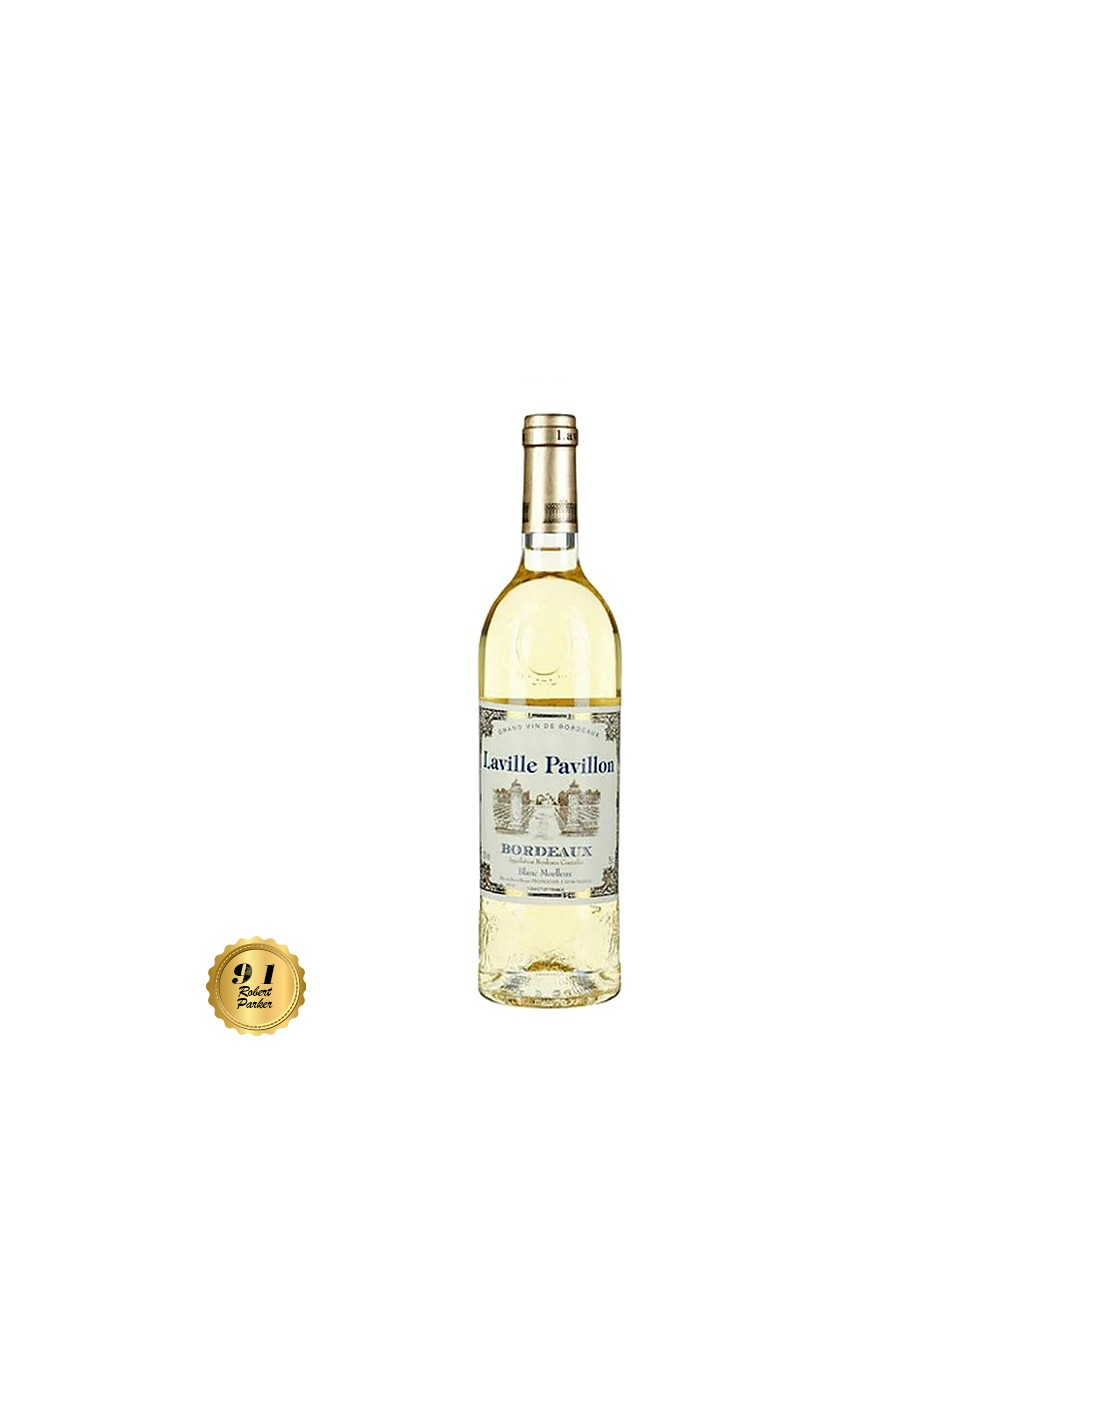 Vin alb sec, Cupaj, Laville Pavillon Bordeaux, 0.75L, 11.5% alc., Franta